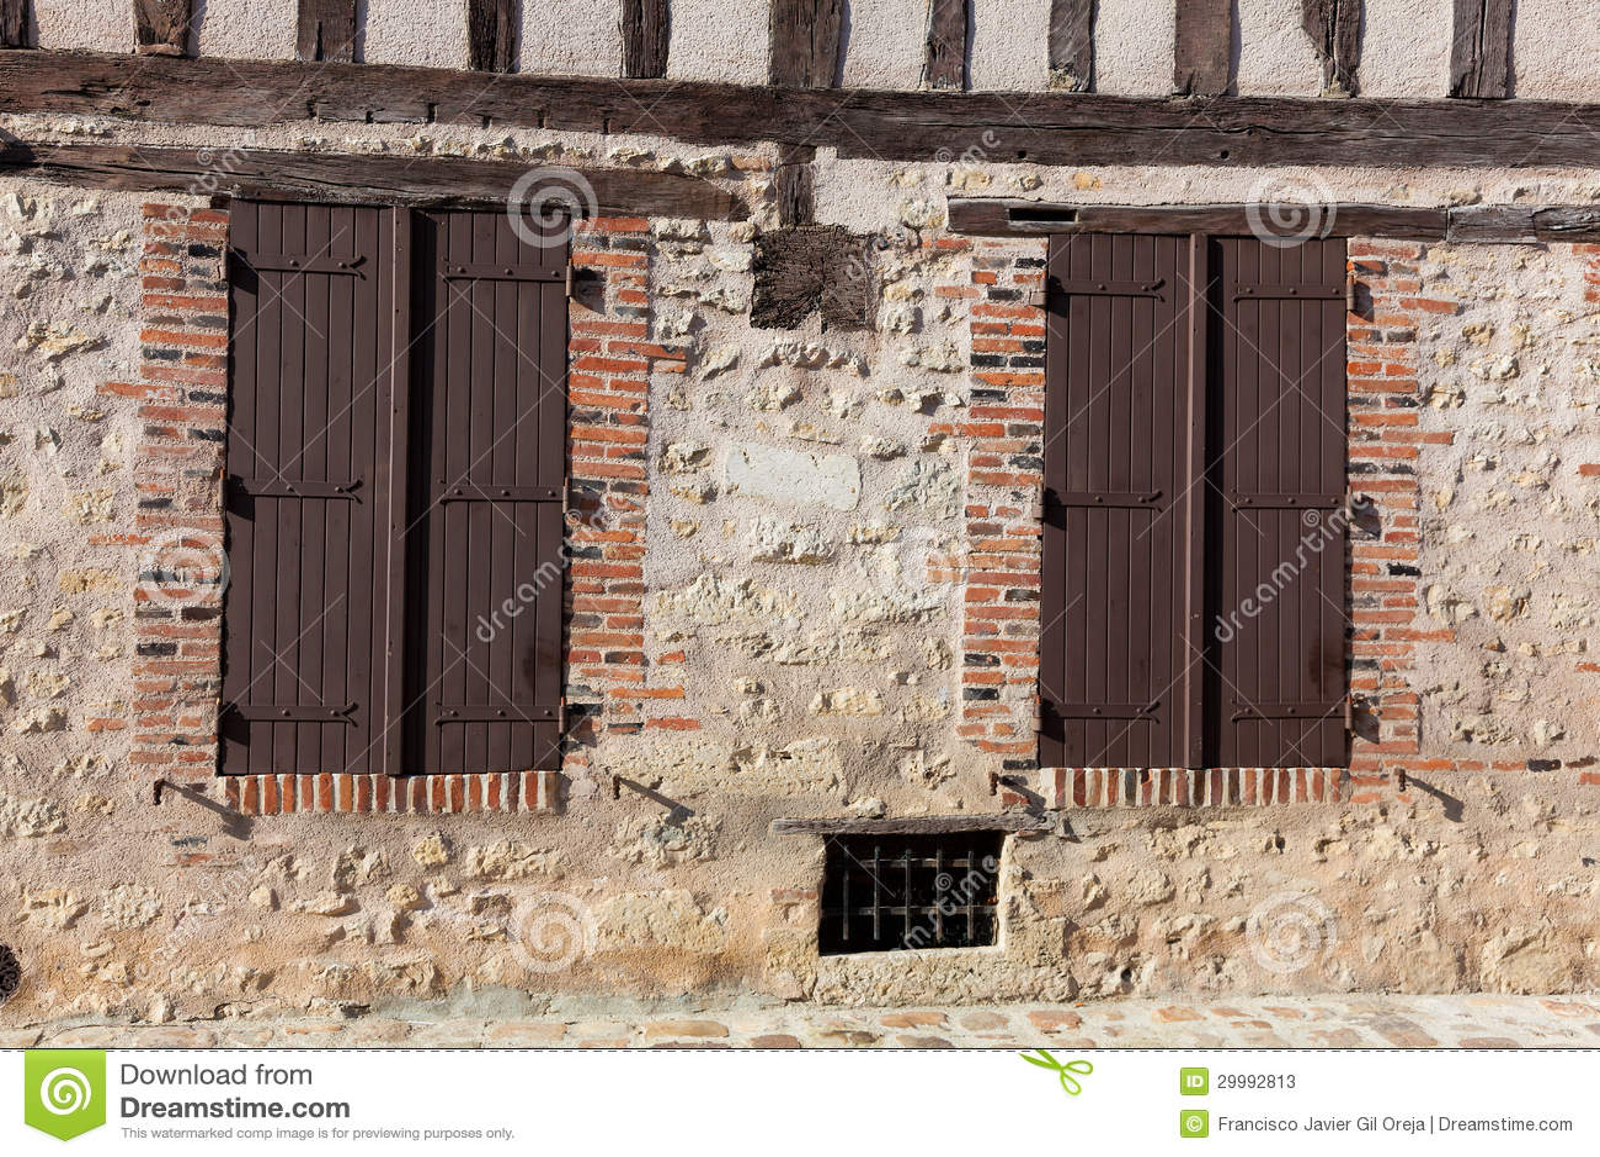 Architecture of provins stock photos image 29992813 - Vide greniers seine et marne ...